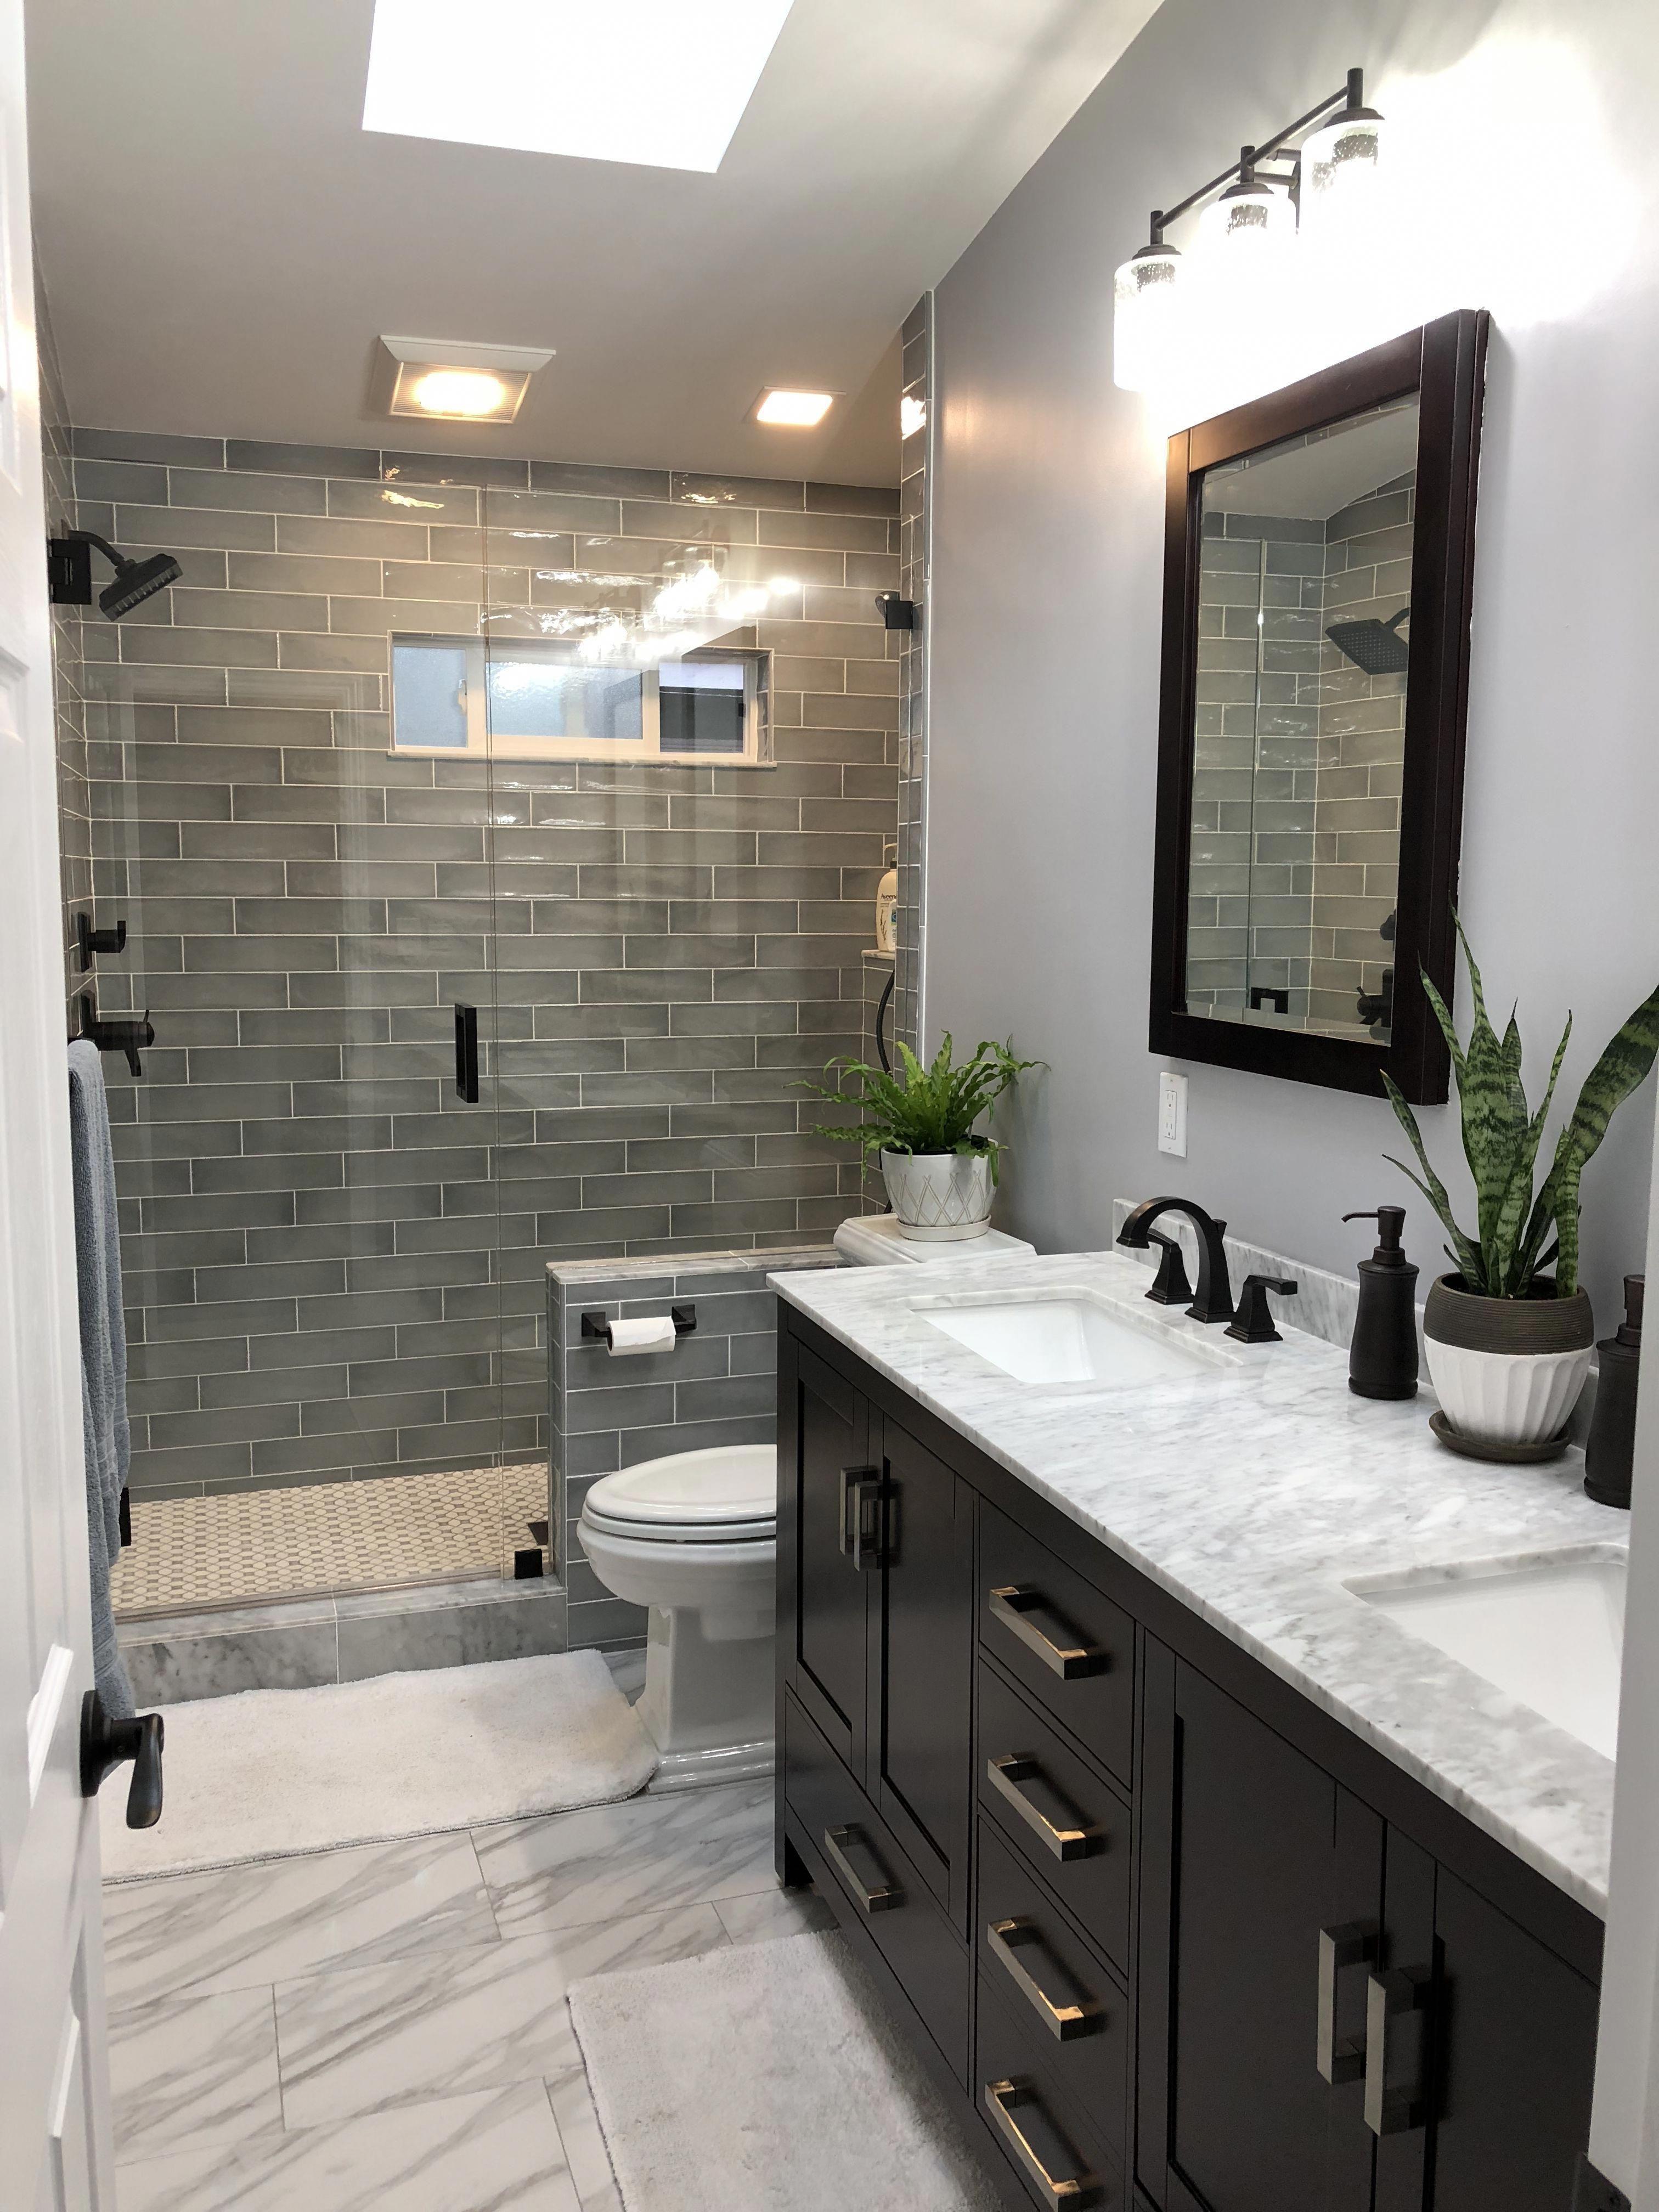 Bathroom Remodelling Bathroom Tile Designs Bathroom Remodel Master Small Bathroom Remodel